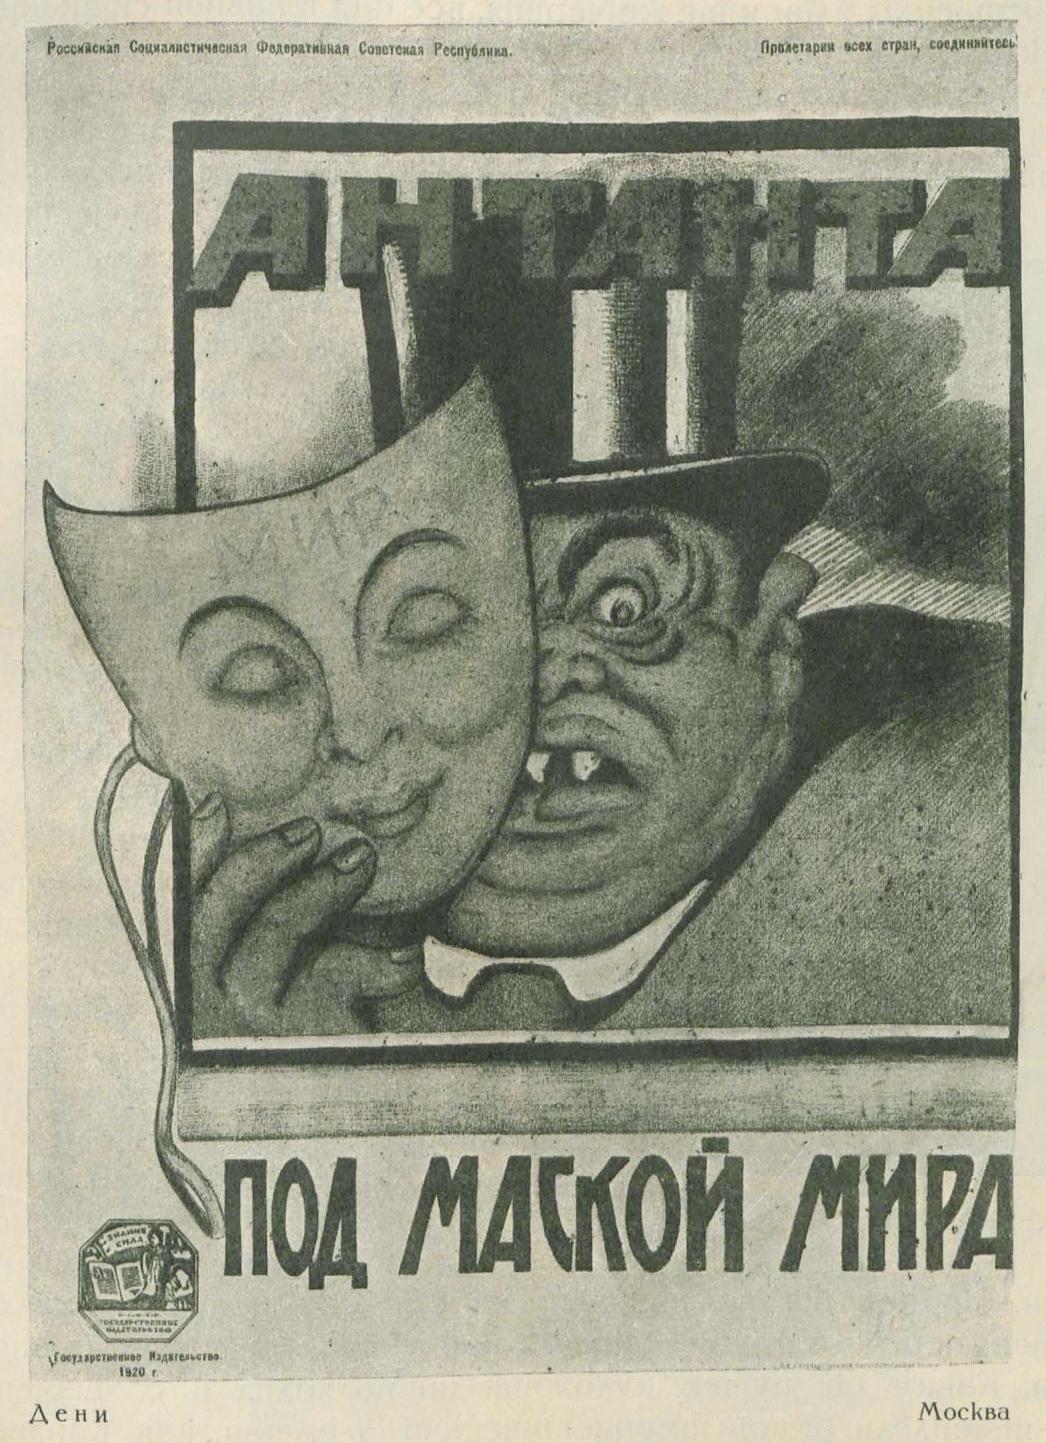 Дени. Москва Многокрасочная литография 53×35 см. Гос. Издат. Москва 1920. Антанта под маской мира